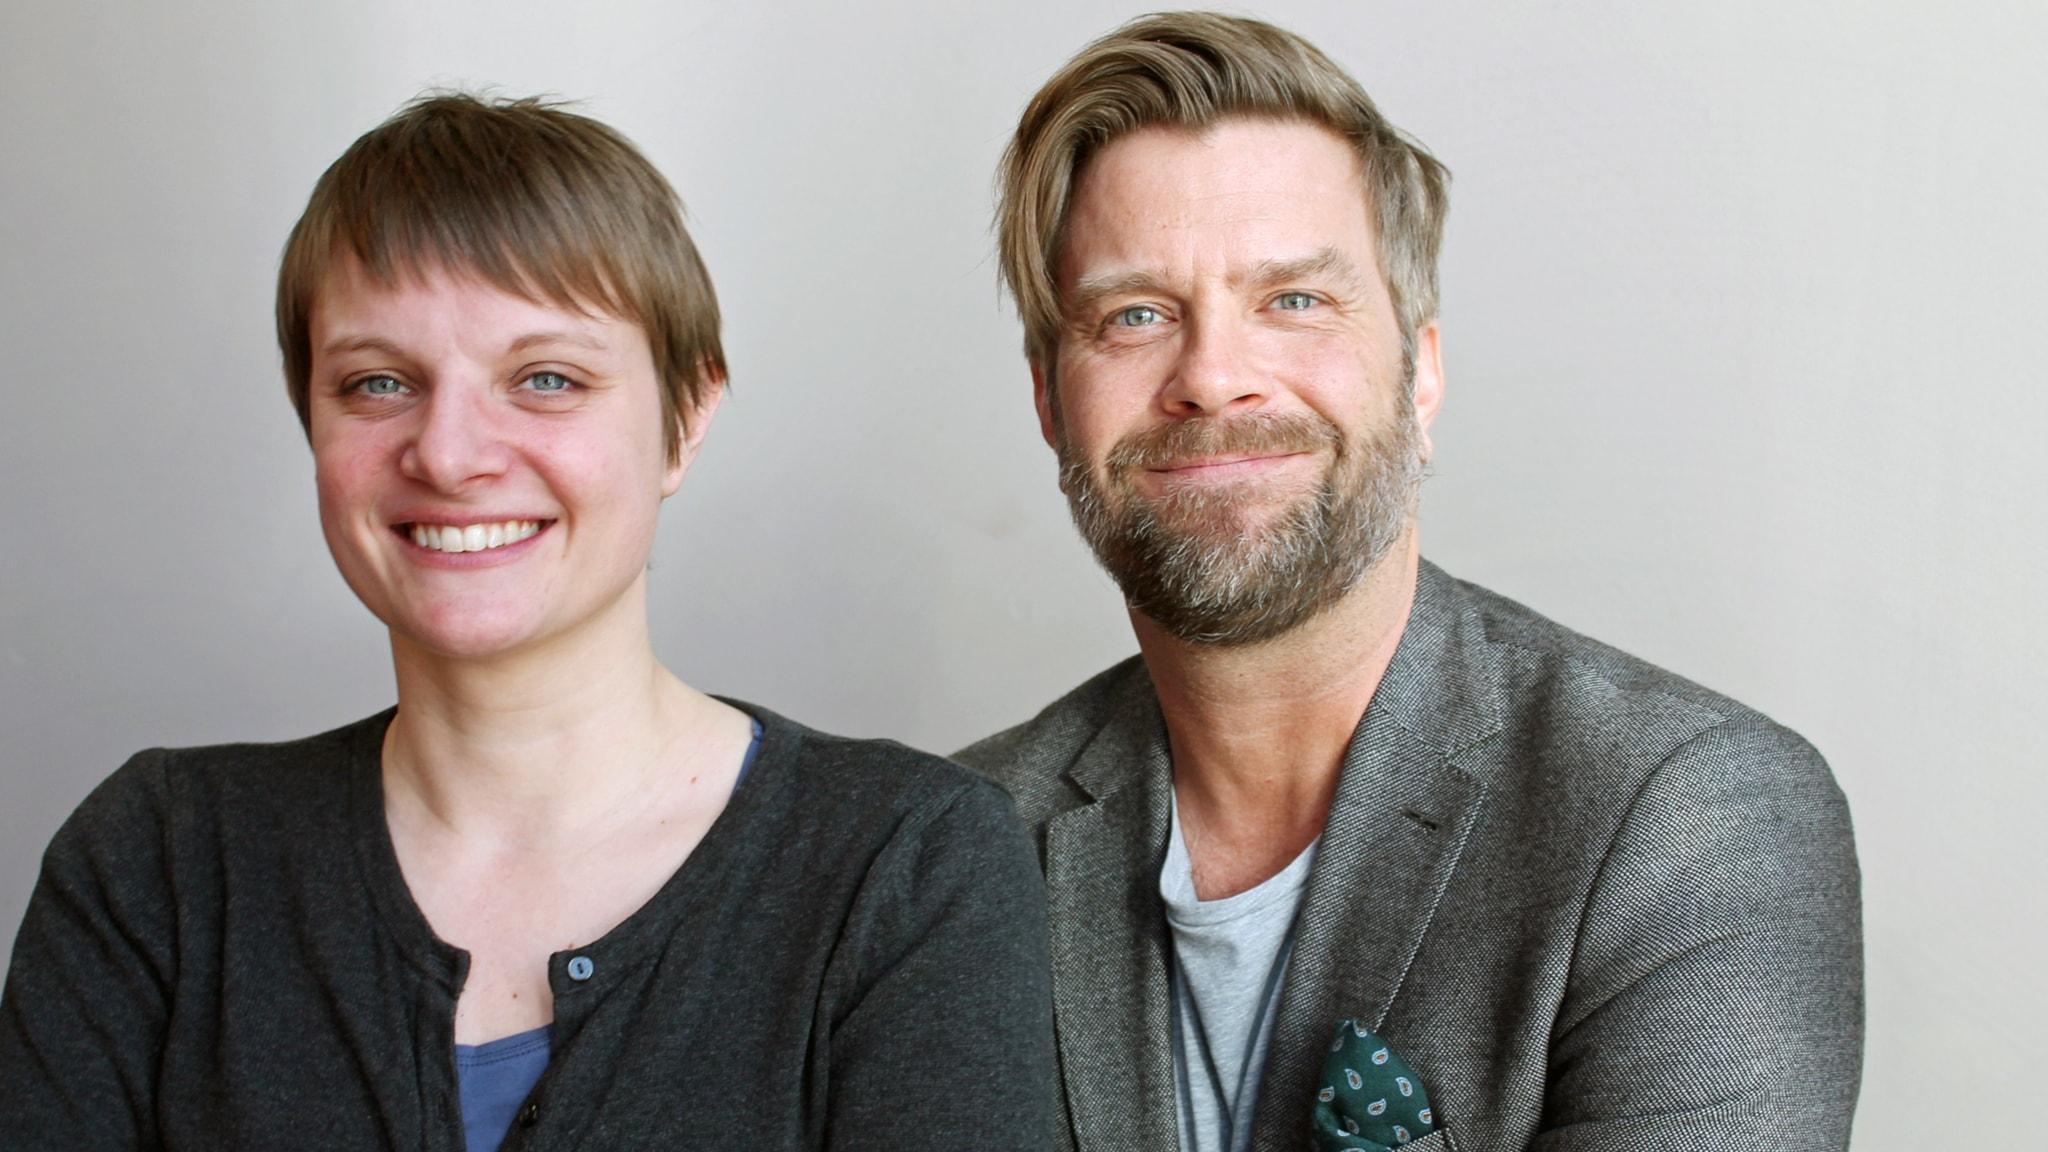 Med Åsa Wistedt och Bosse Pettersson - spela